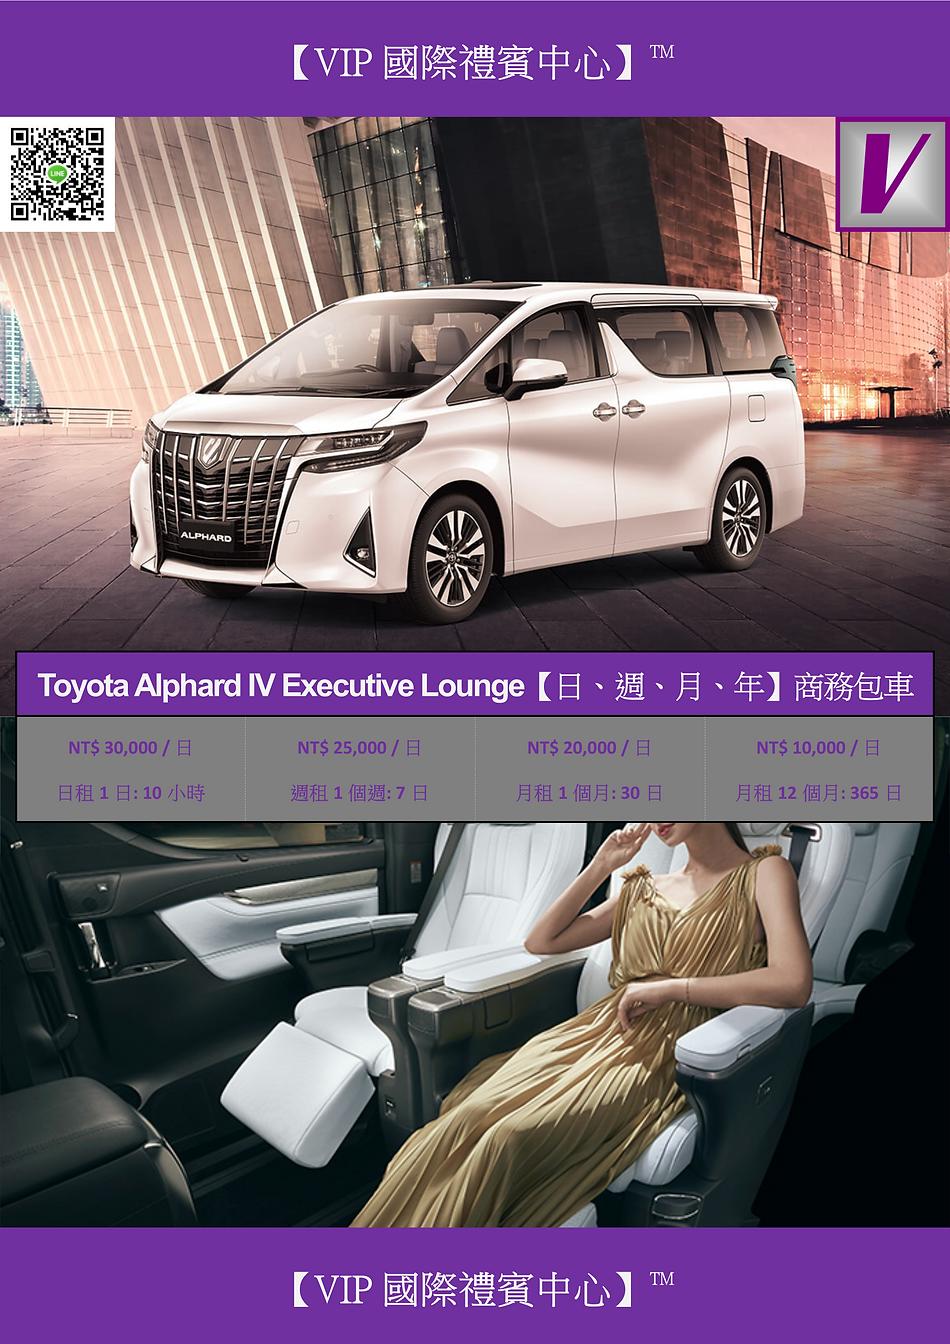 VIP國際禮賓中心 TOYOTA ALPHARD IV EXECUTIVE LOUNGE 臺北市區接送包車